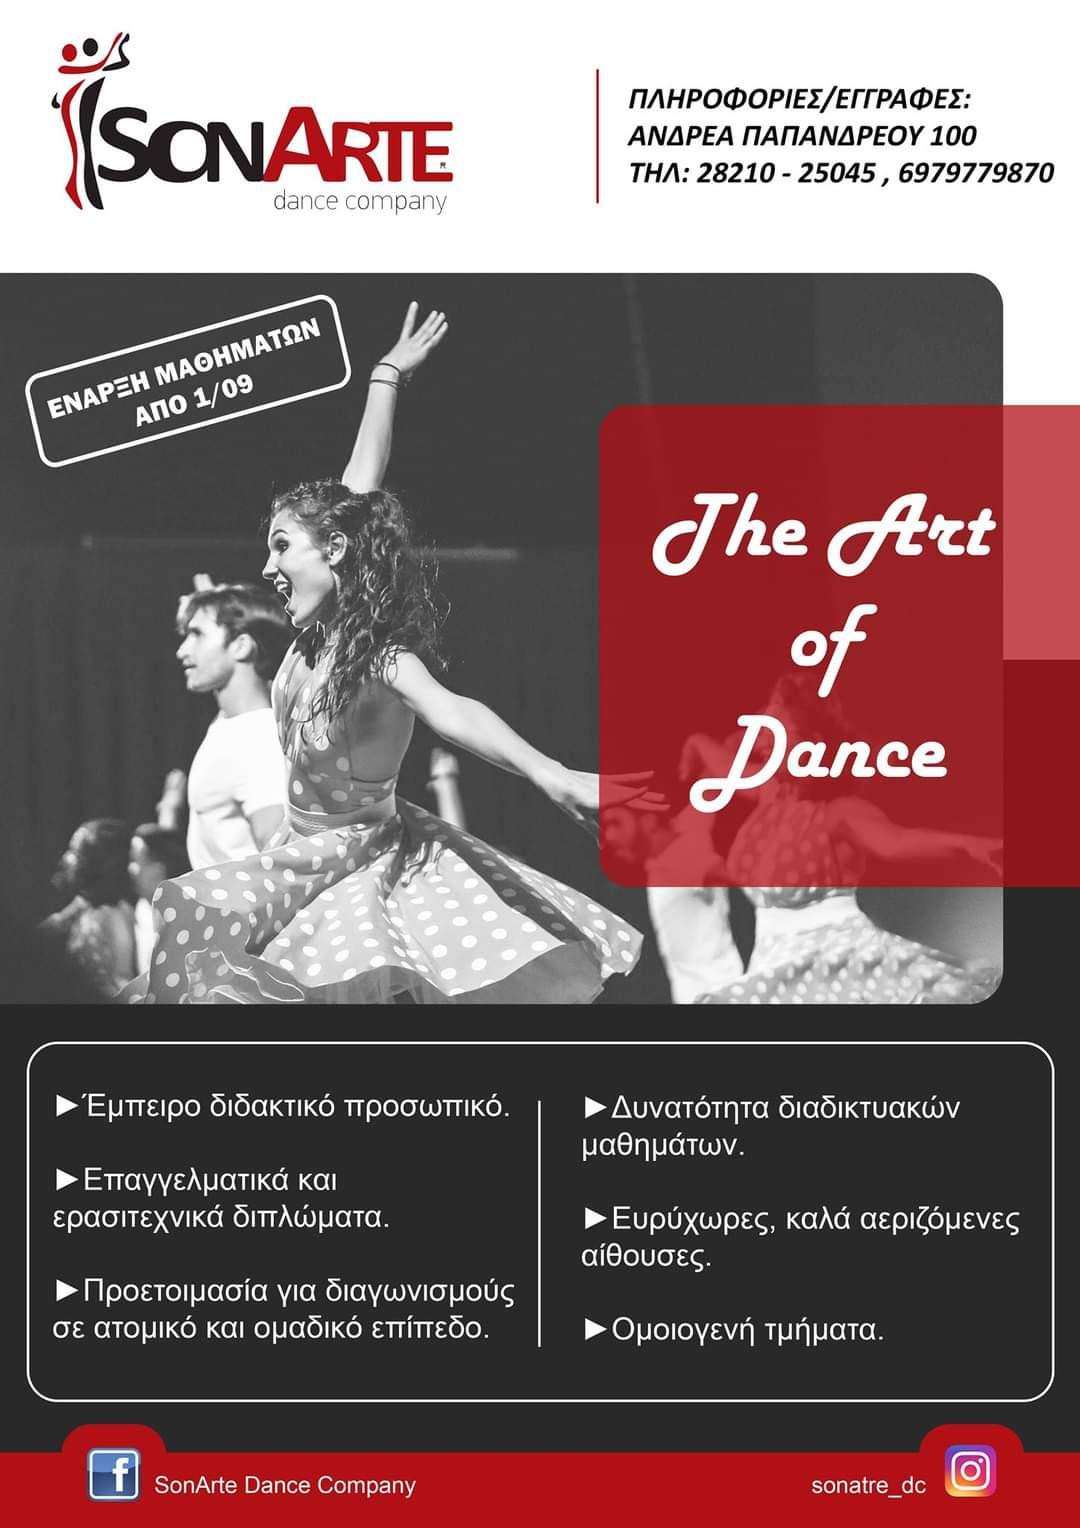 SonArte Dance Company, σχολή χορού στα Χανιά